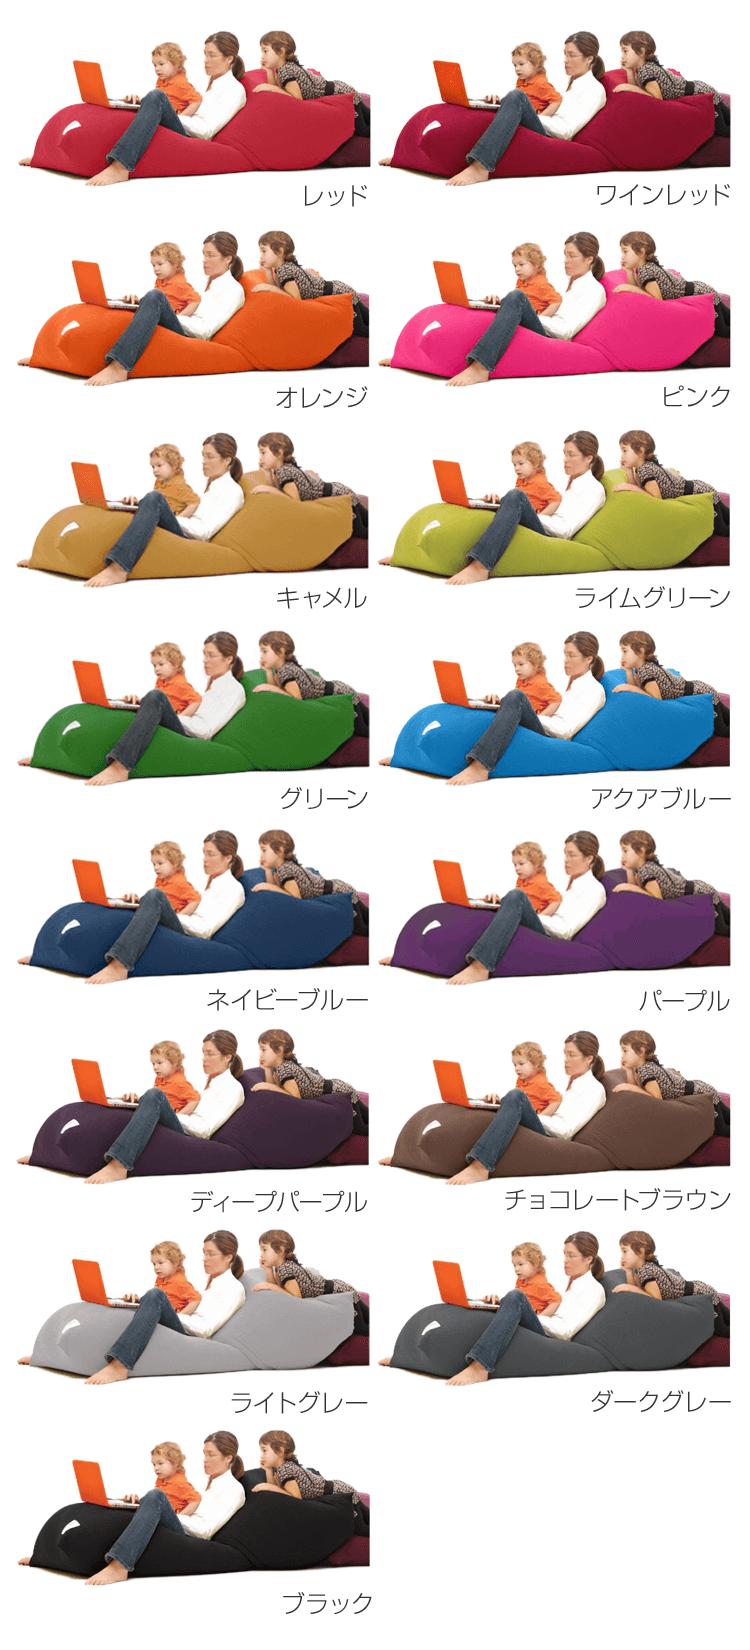 Yogibo Maxカラーバリエーション 収納 アイデア ヨギボー アイデア